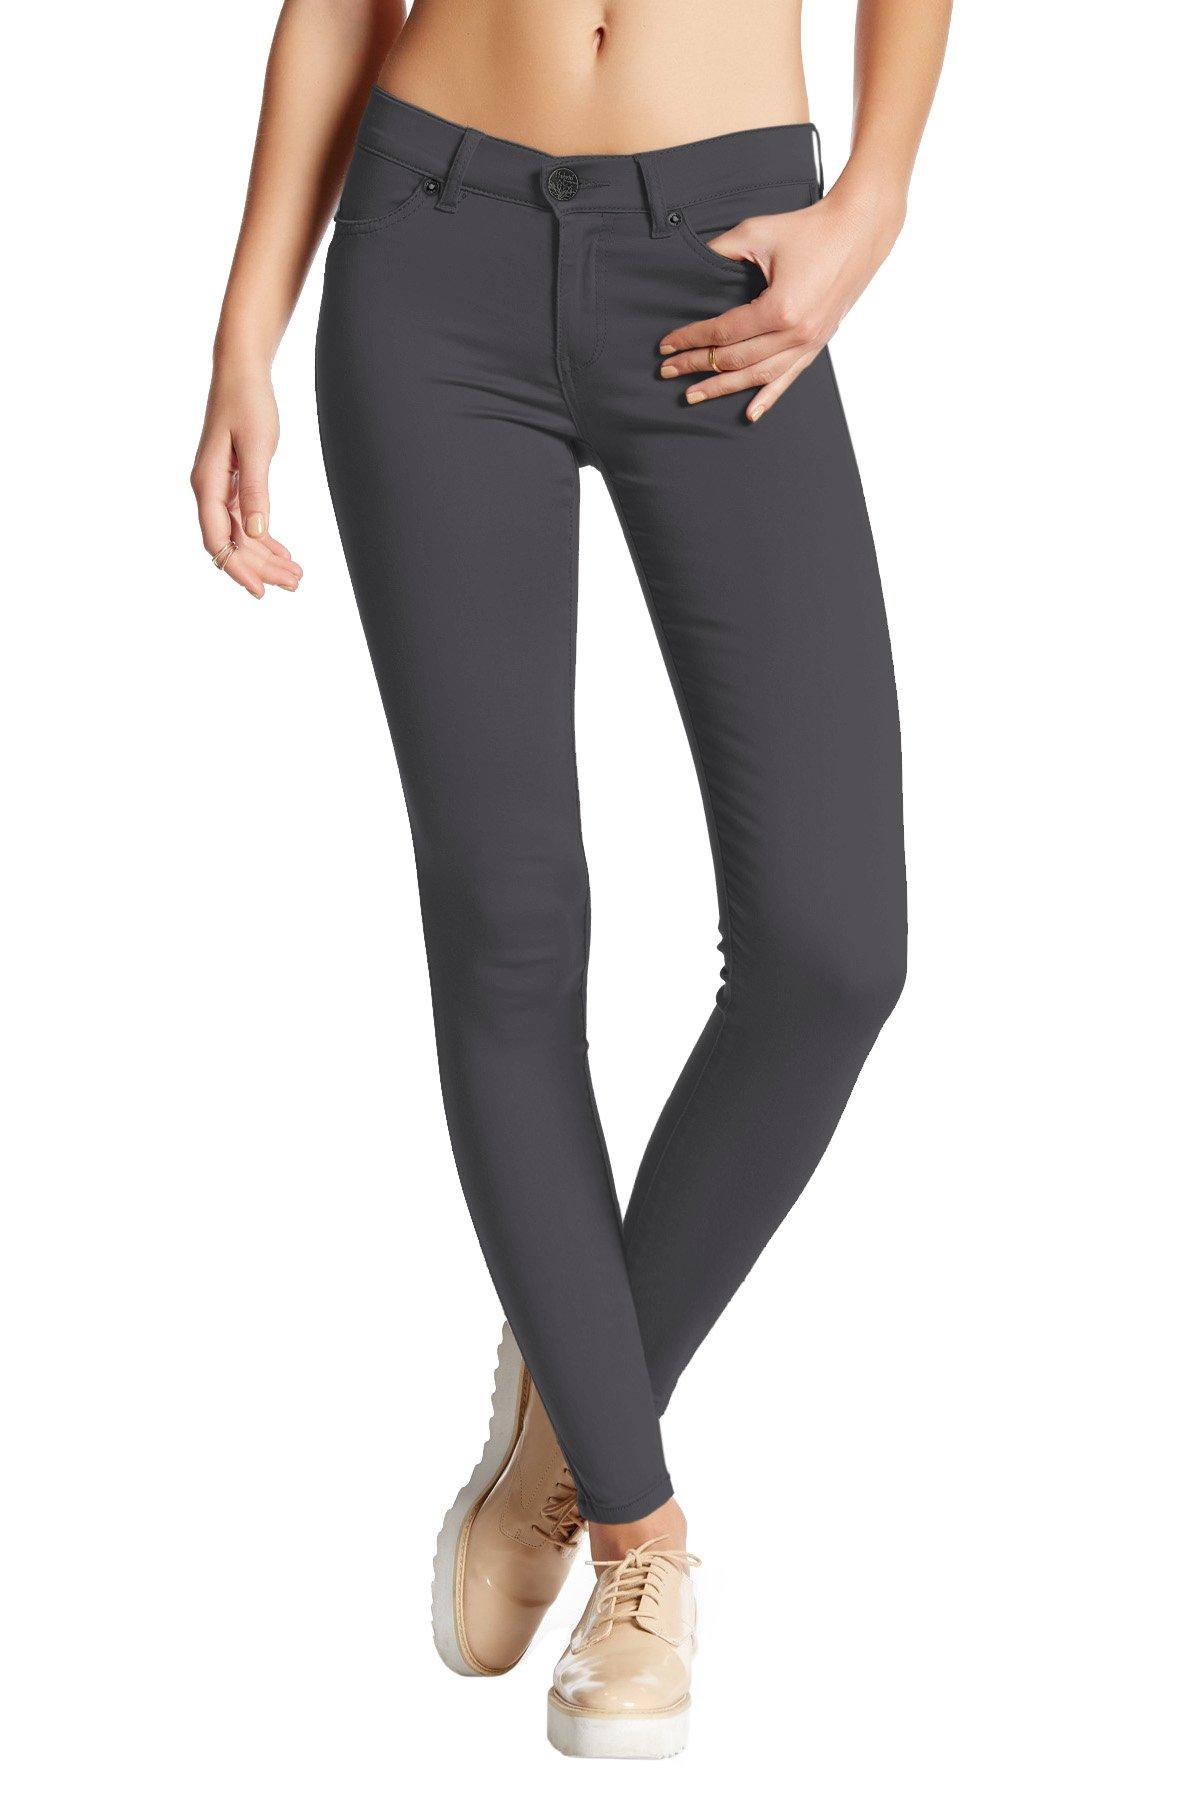 HyBrid & Company Womens Super Stretch Comfy Skinny Pants P44876SKX Charcoal 3X